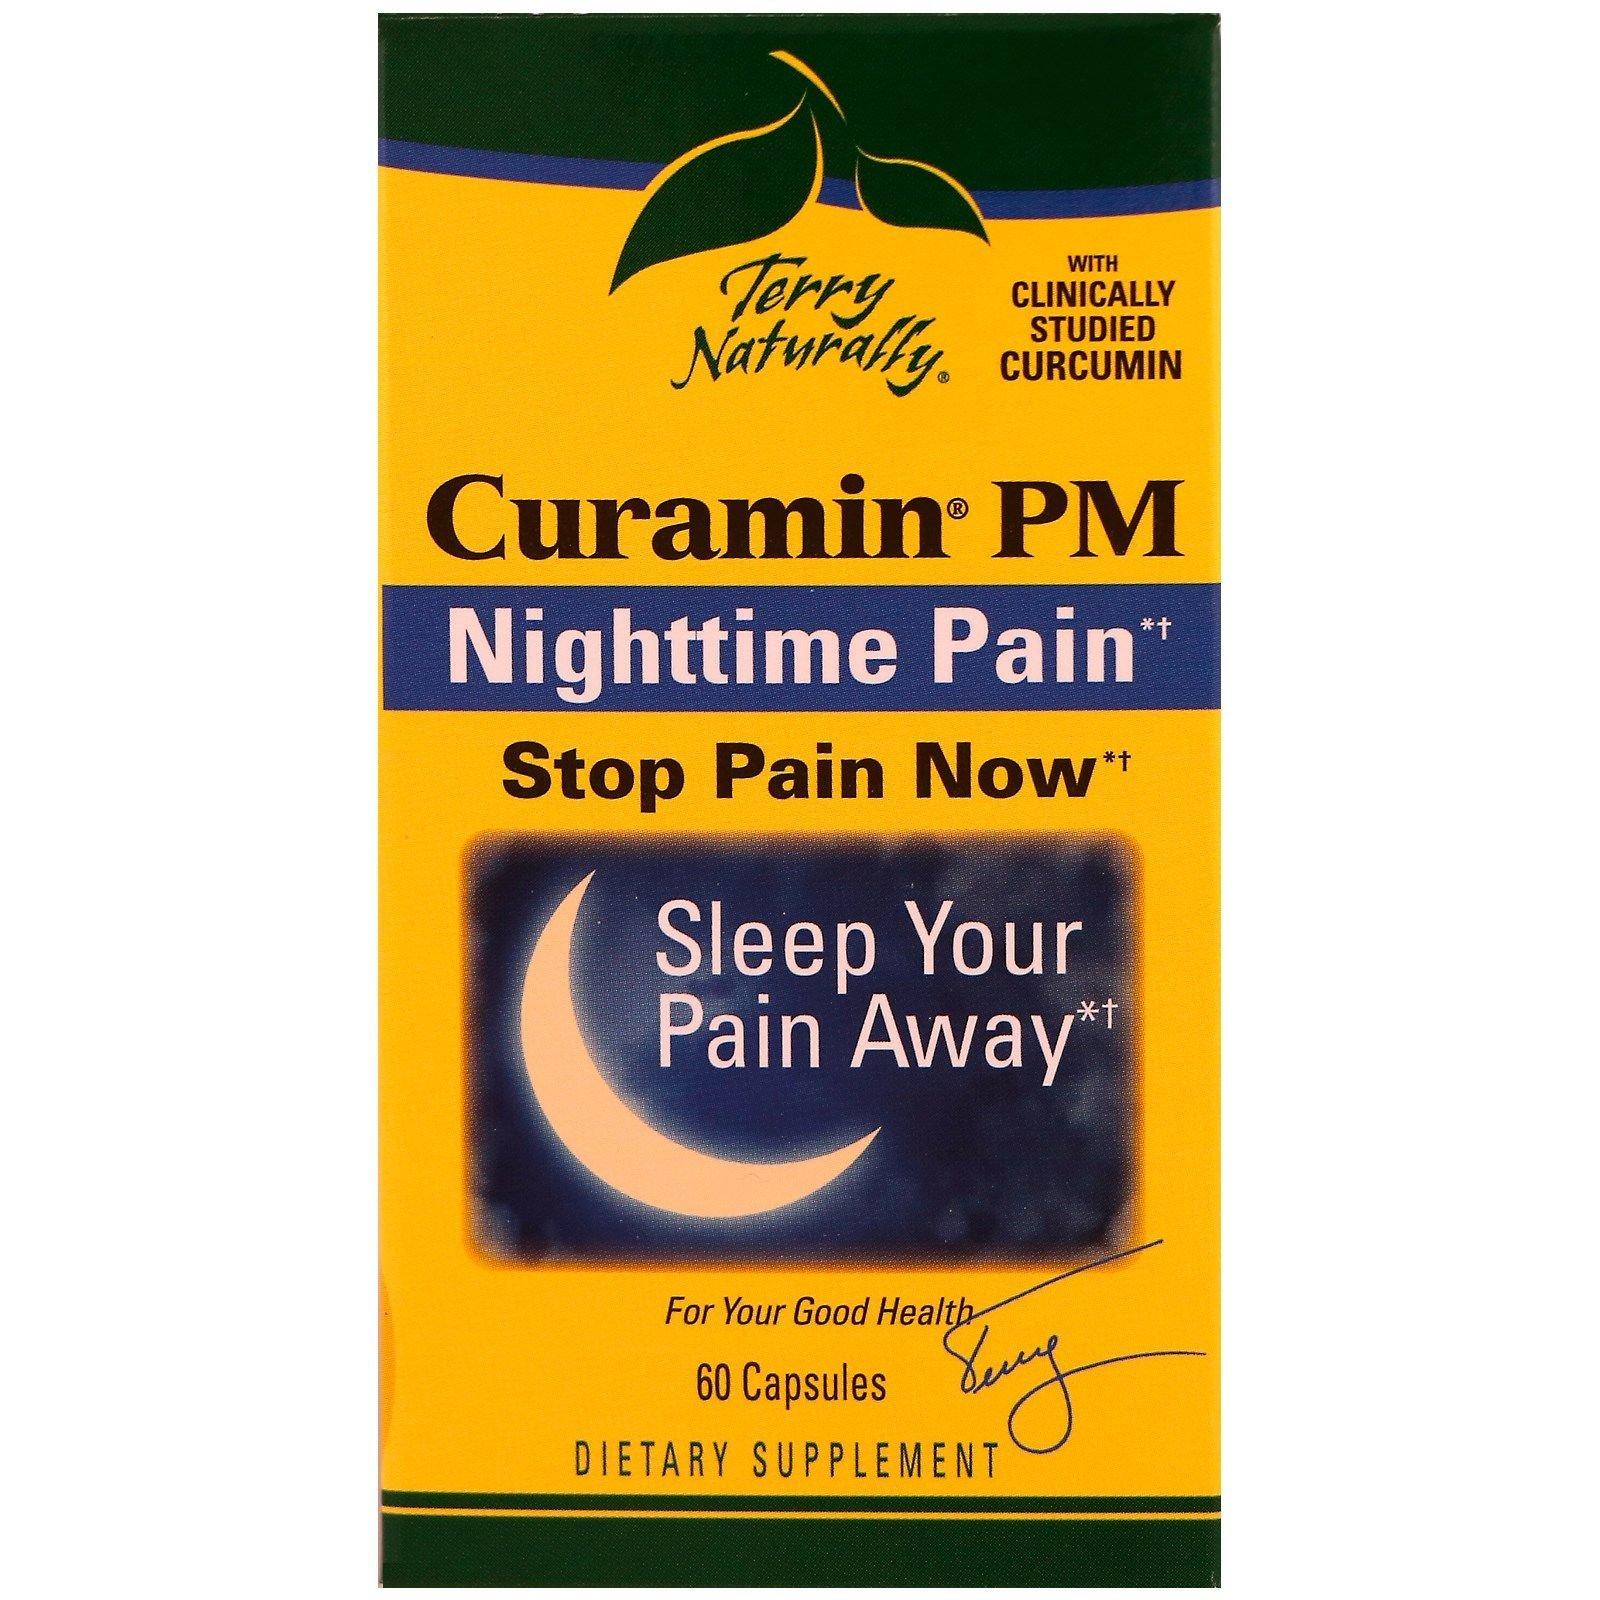 EuroPharma Terry Naturally Curamin PM Nighttime Pain Relief 60 Capsules